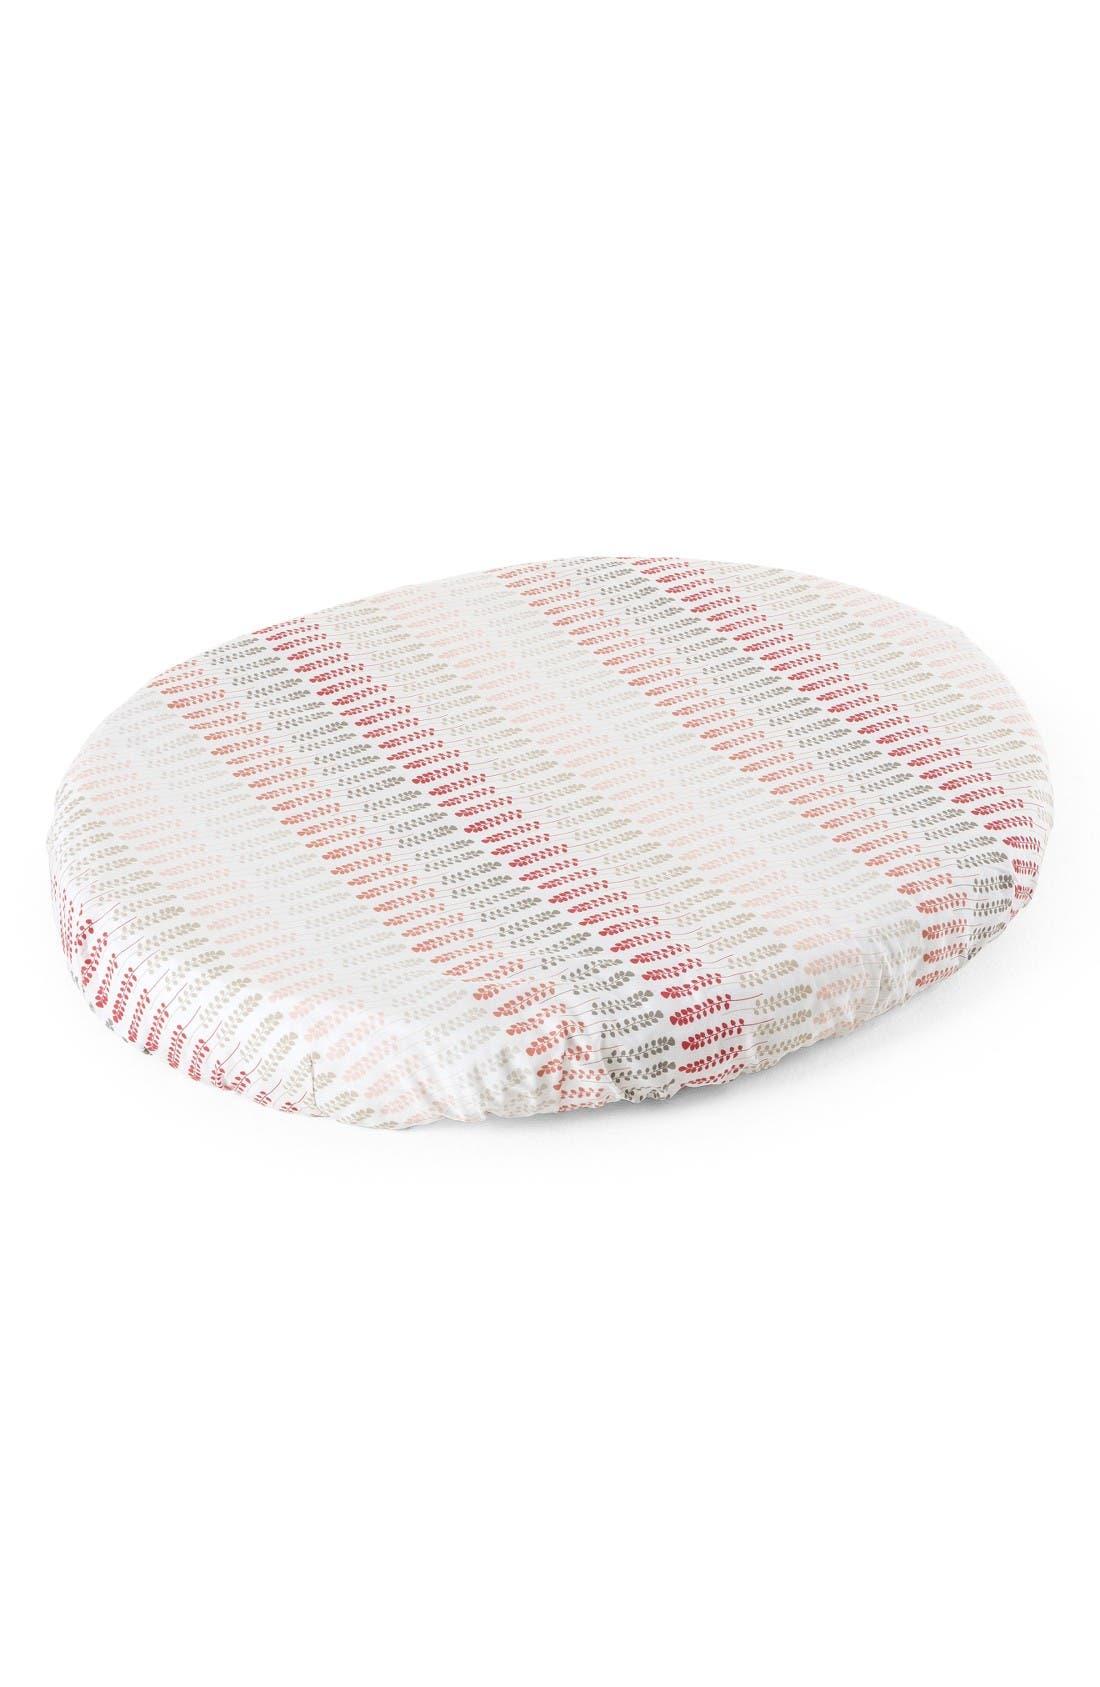 Alternate Image 1 Selected - Stokke Sleepi Mini Fitted Crib Sheet